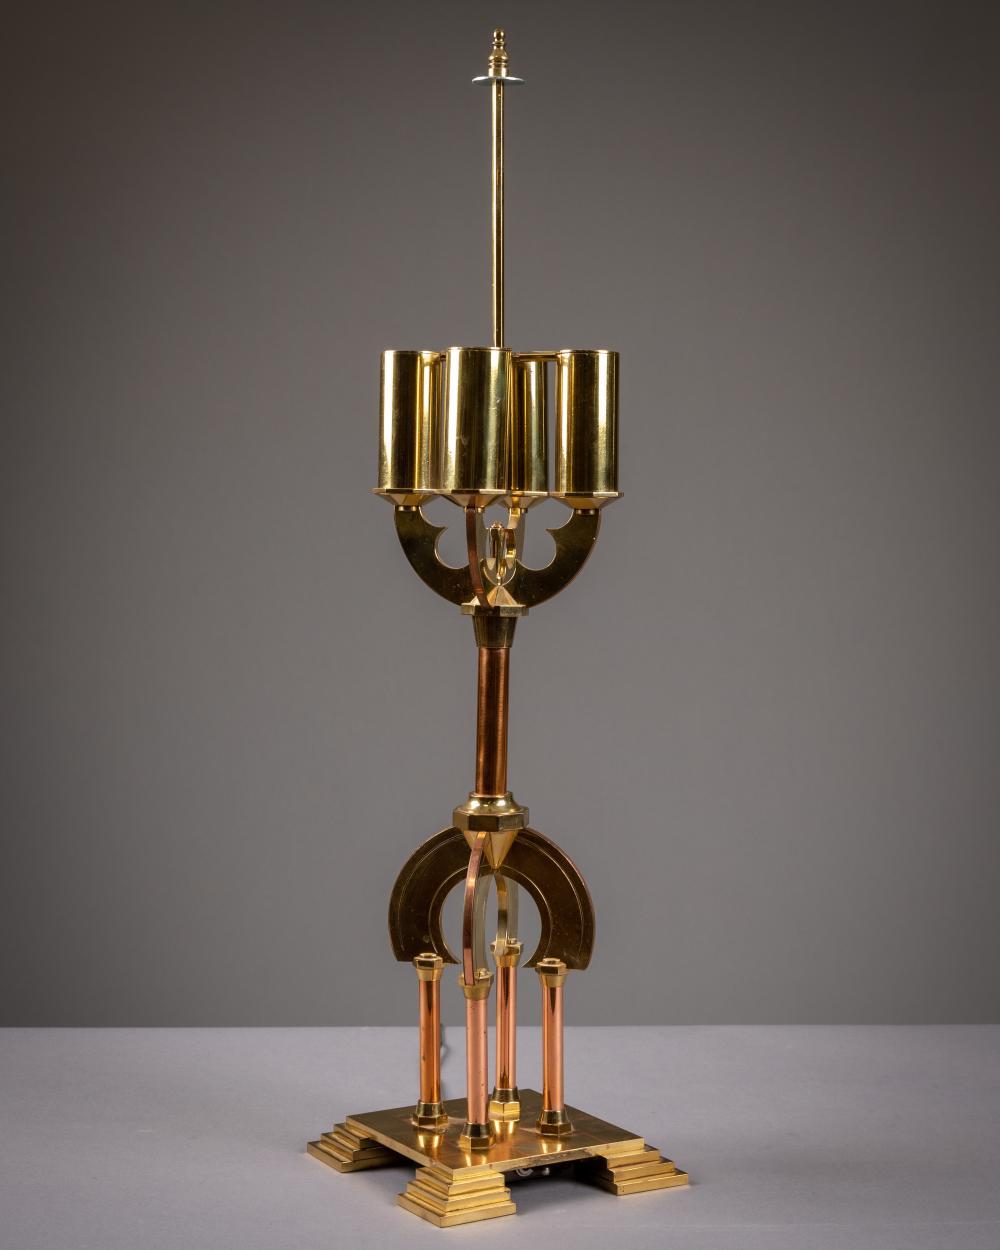 Tommi Parzinger (Attr) - Brass & Copper Lamp